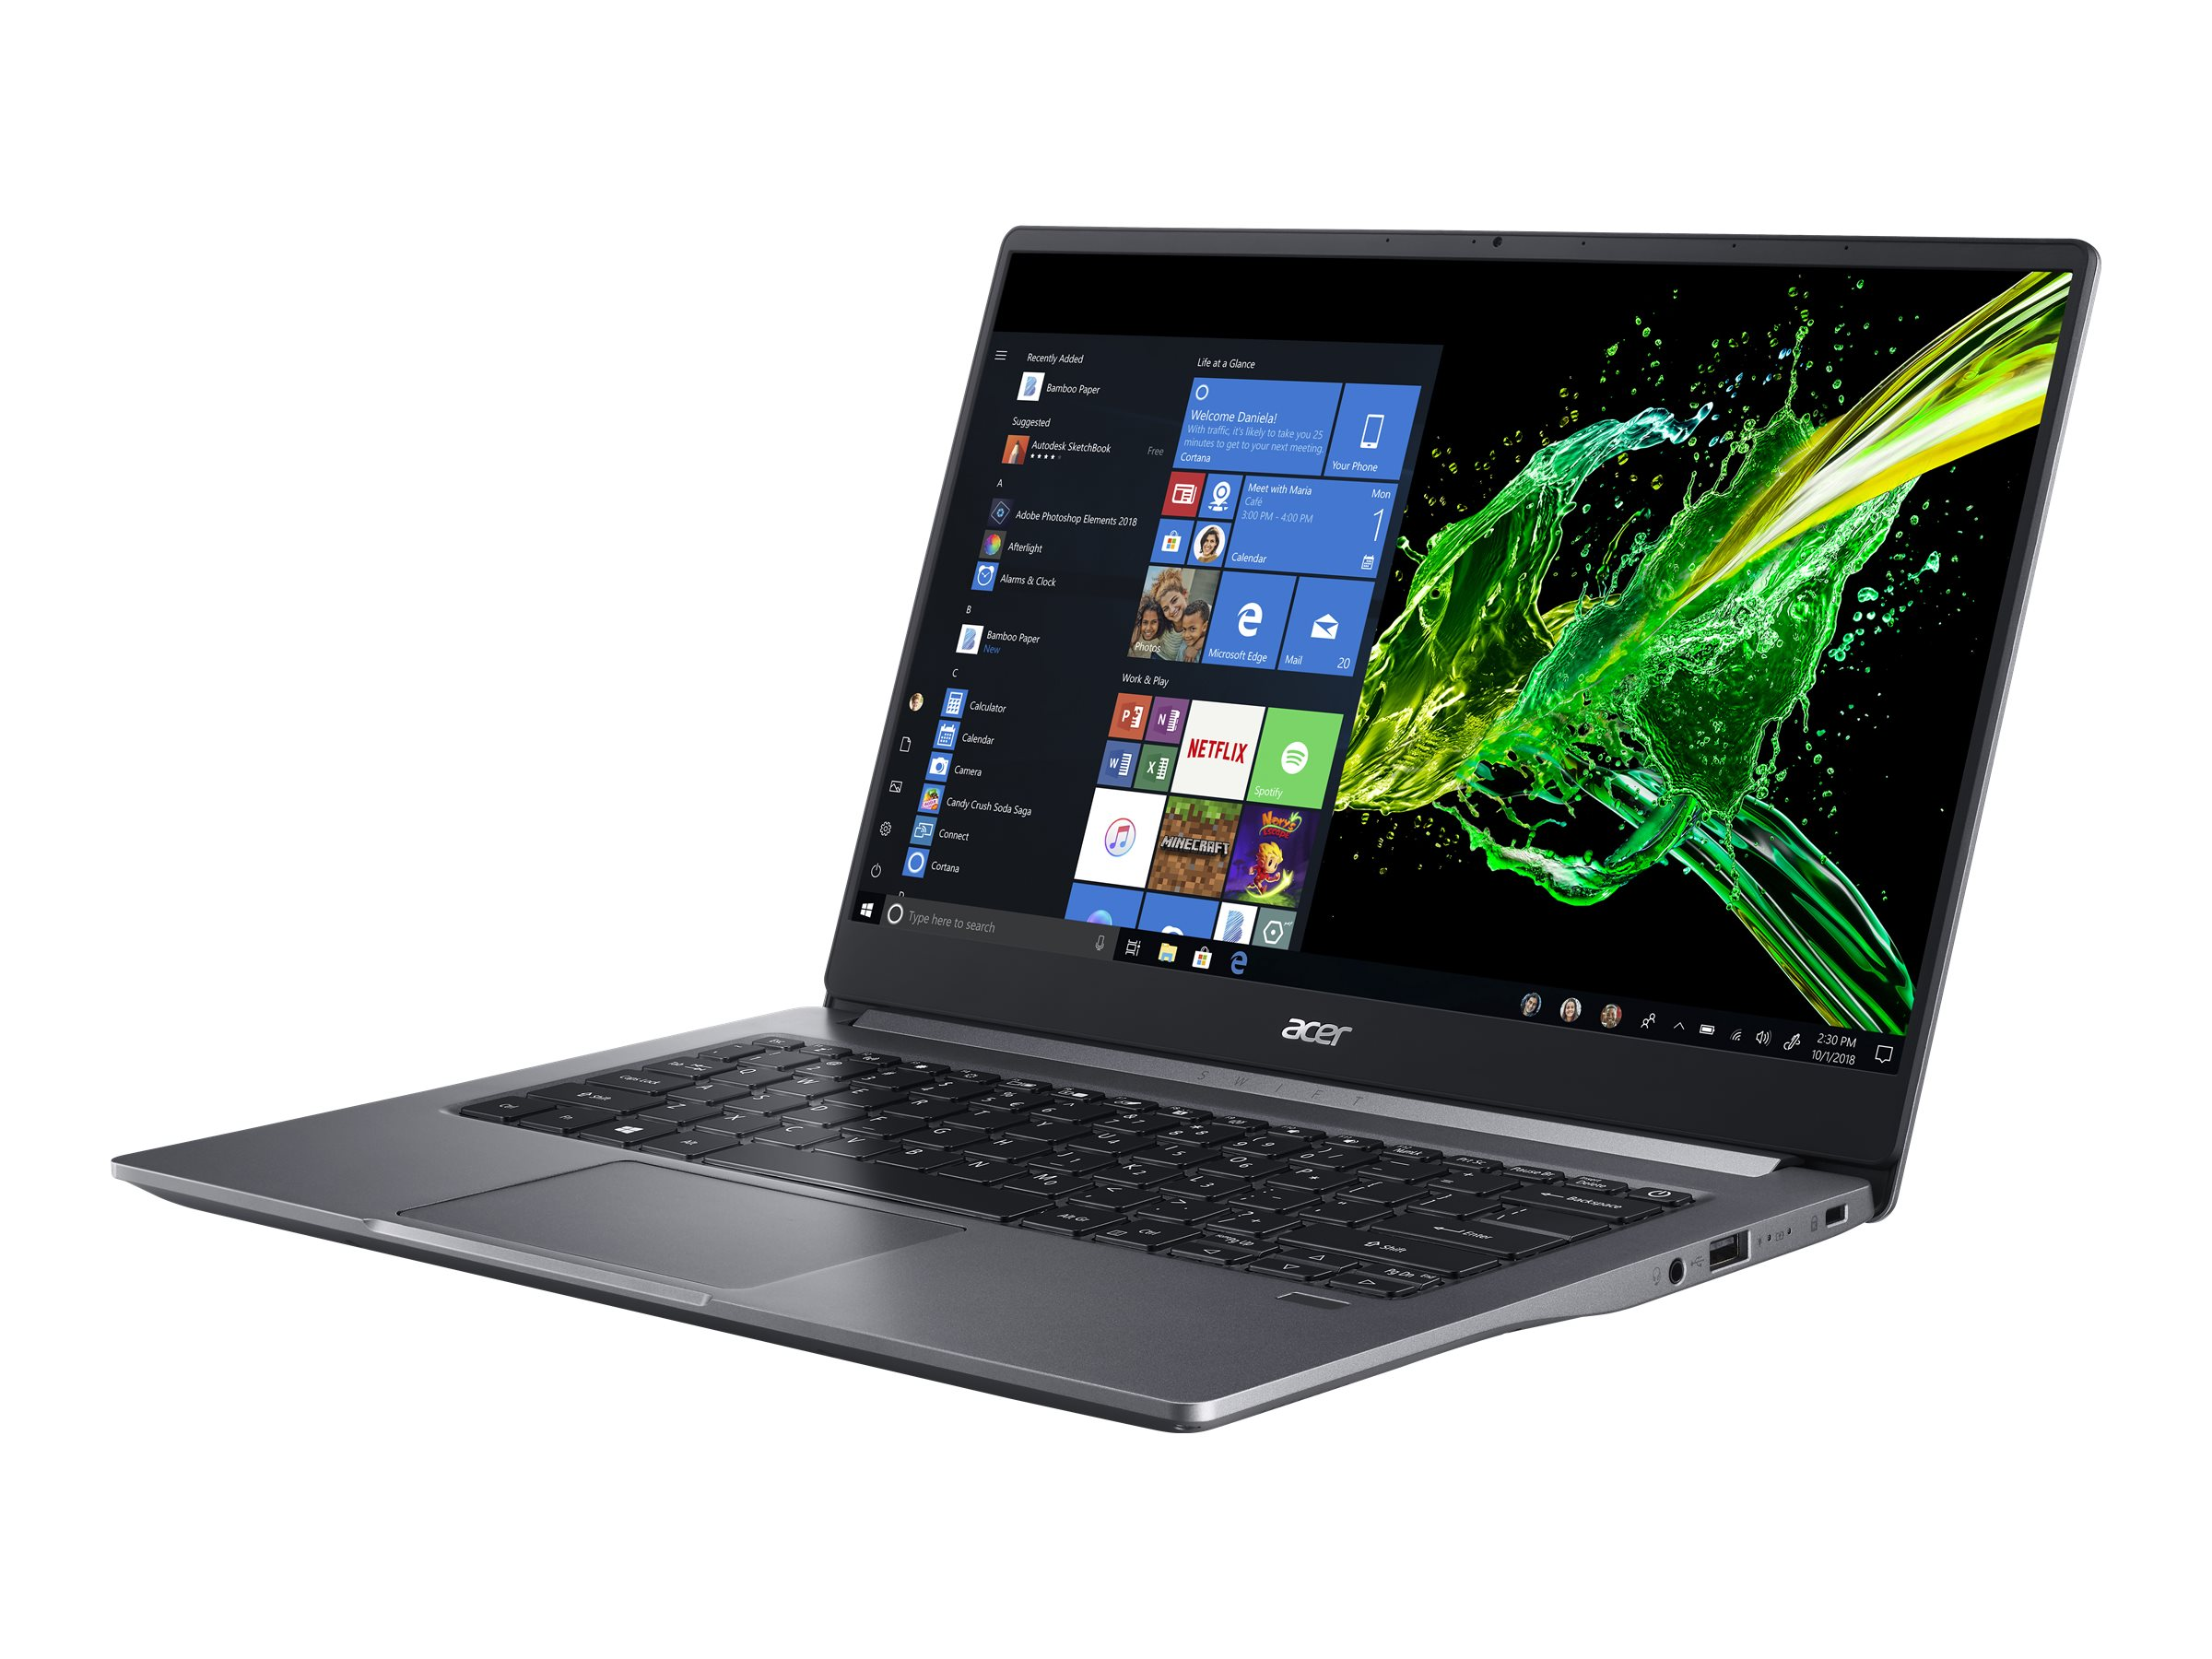 "Acer Swift 3 SF314-57-55BK - Core i5 1035G1 / 1 GHz - Win 10 Home 64-Bit - 8 GB RAM - 512 GB SSD - 35.6 cm (14"")"